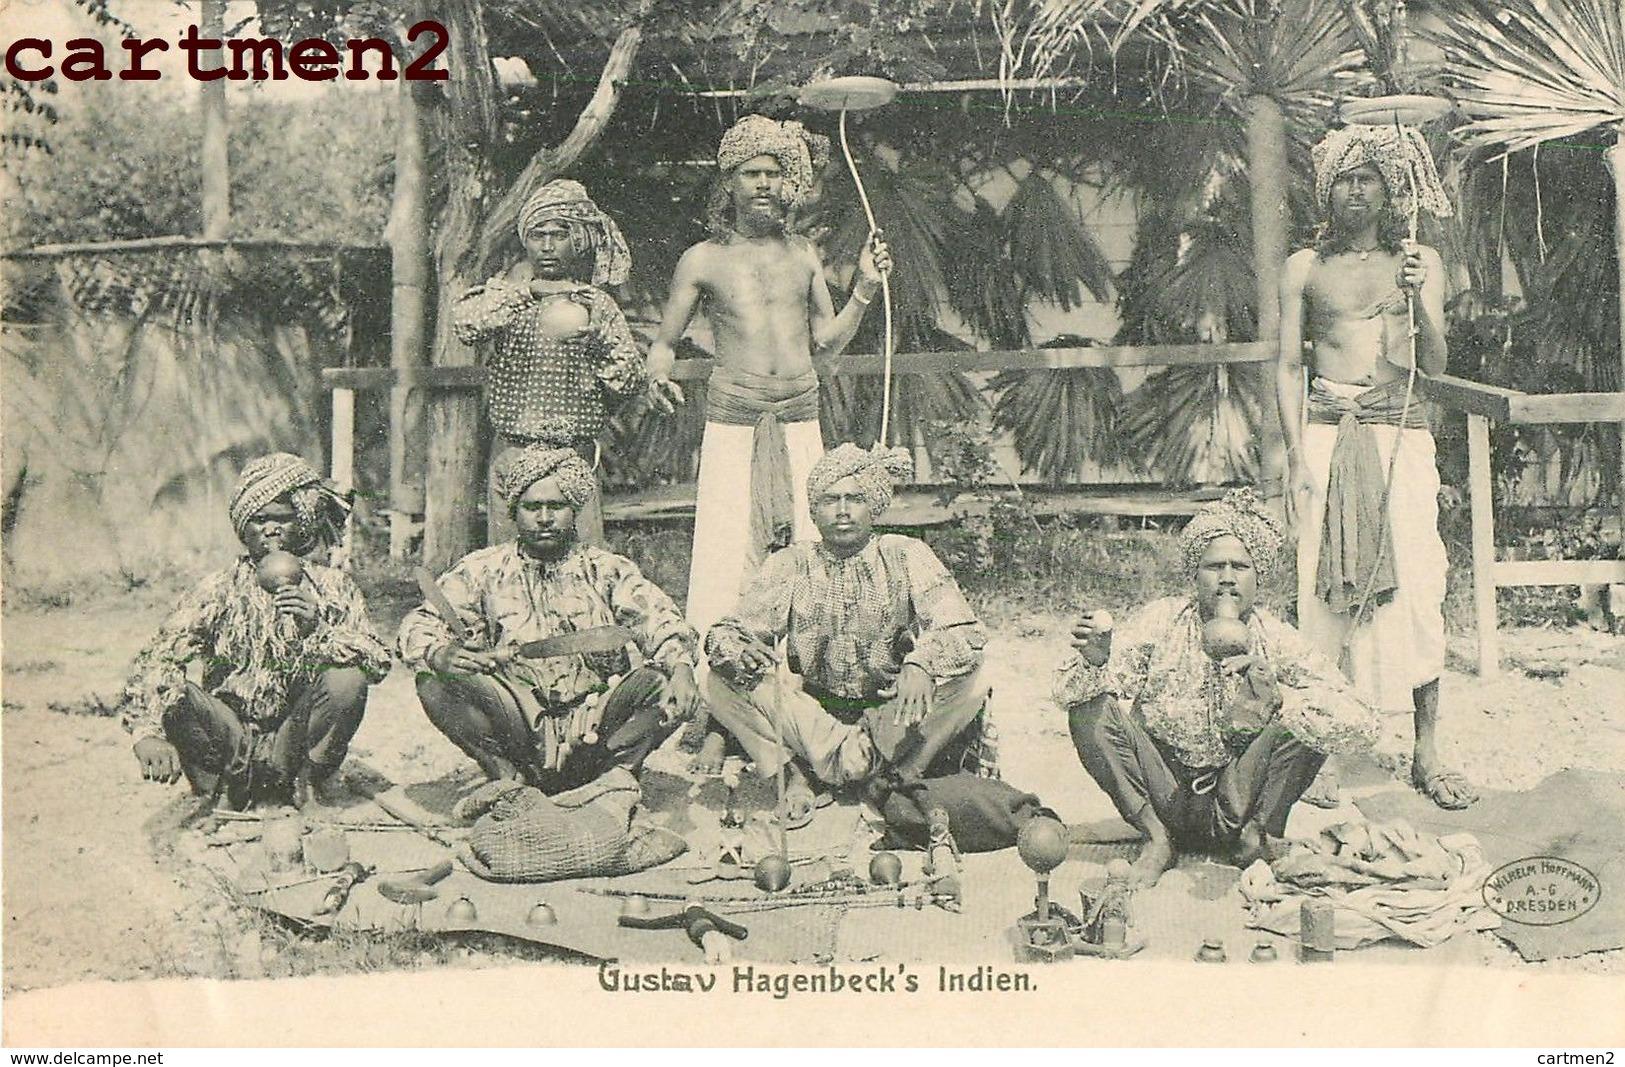 INDE INDIA GUSTAV HAGENBECK'S INDIEN EXPOSITION COLONIALE ? ETHNIC ETHNOLOGIE FAKIR SPECTACLE CIRQUE CARAVANE - Indien